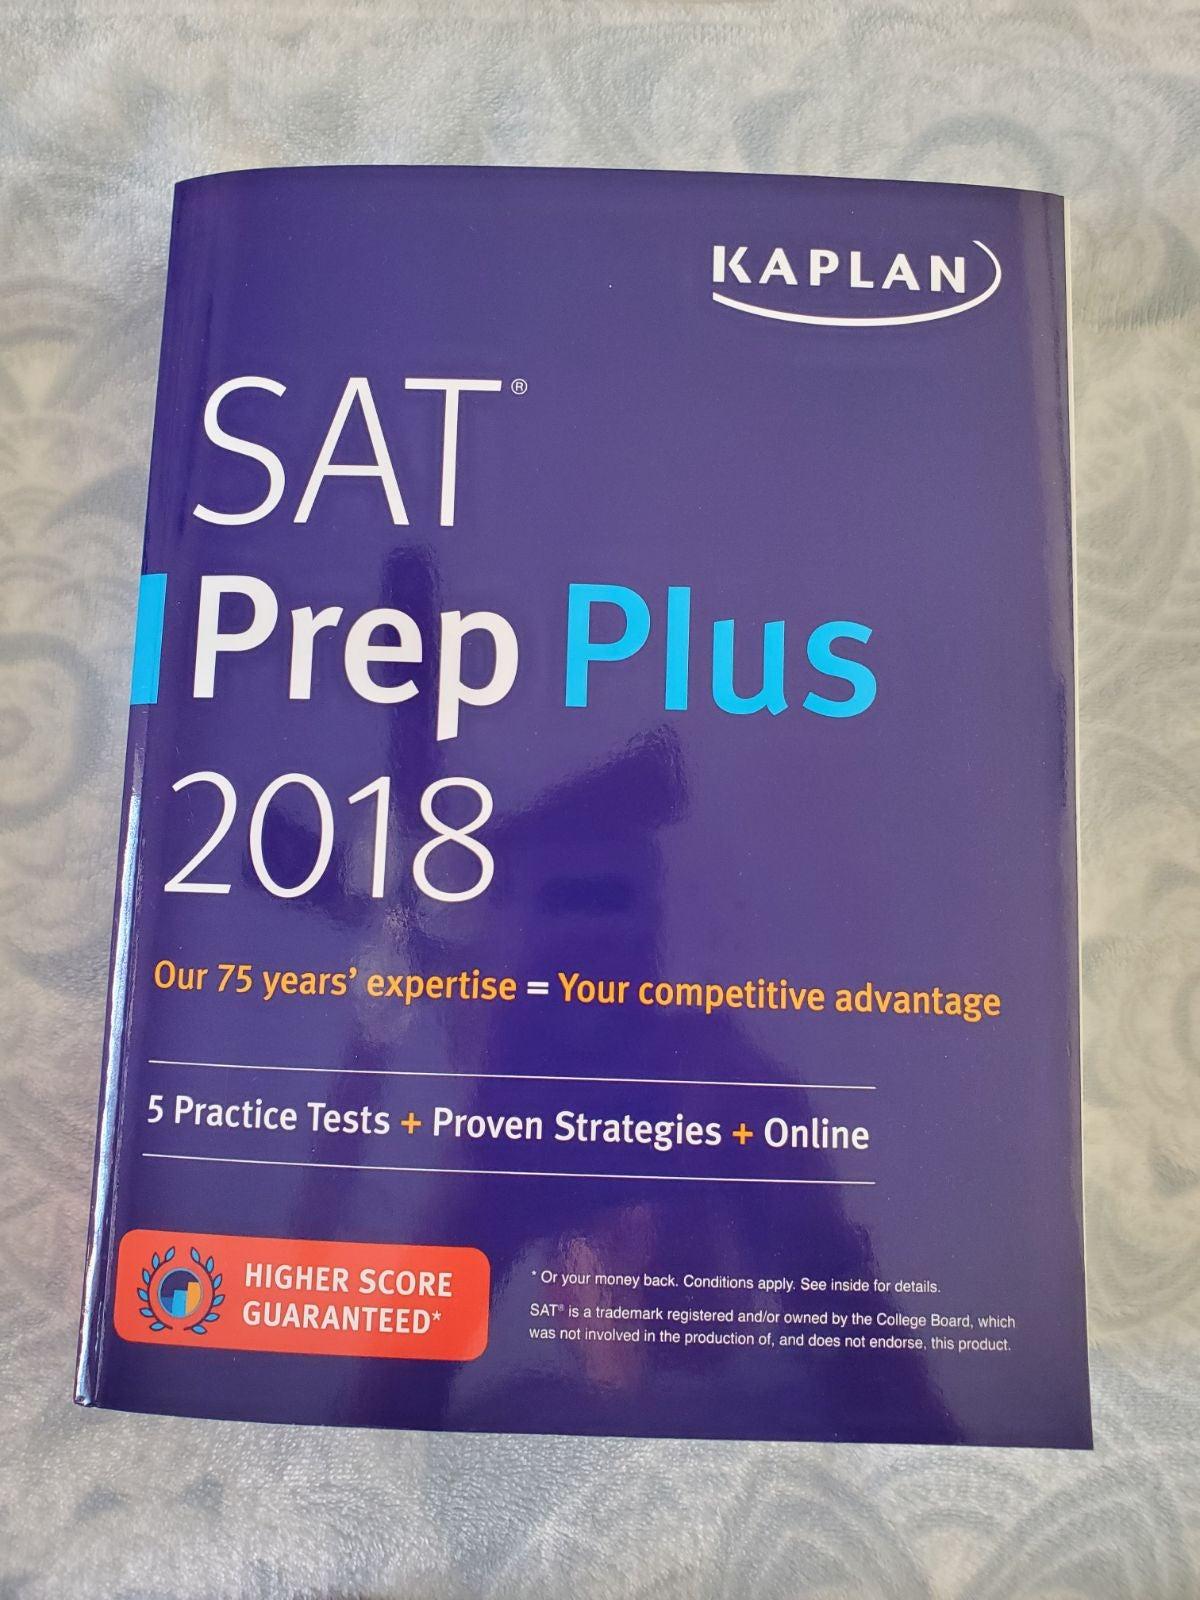 SAT Prep Plus Book Kaplan 2018